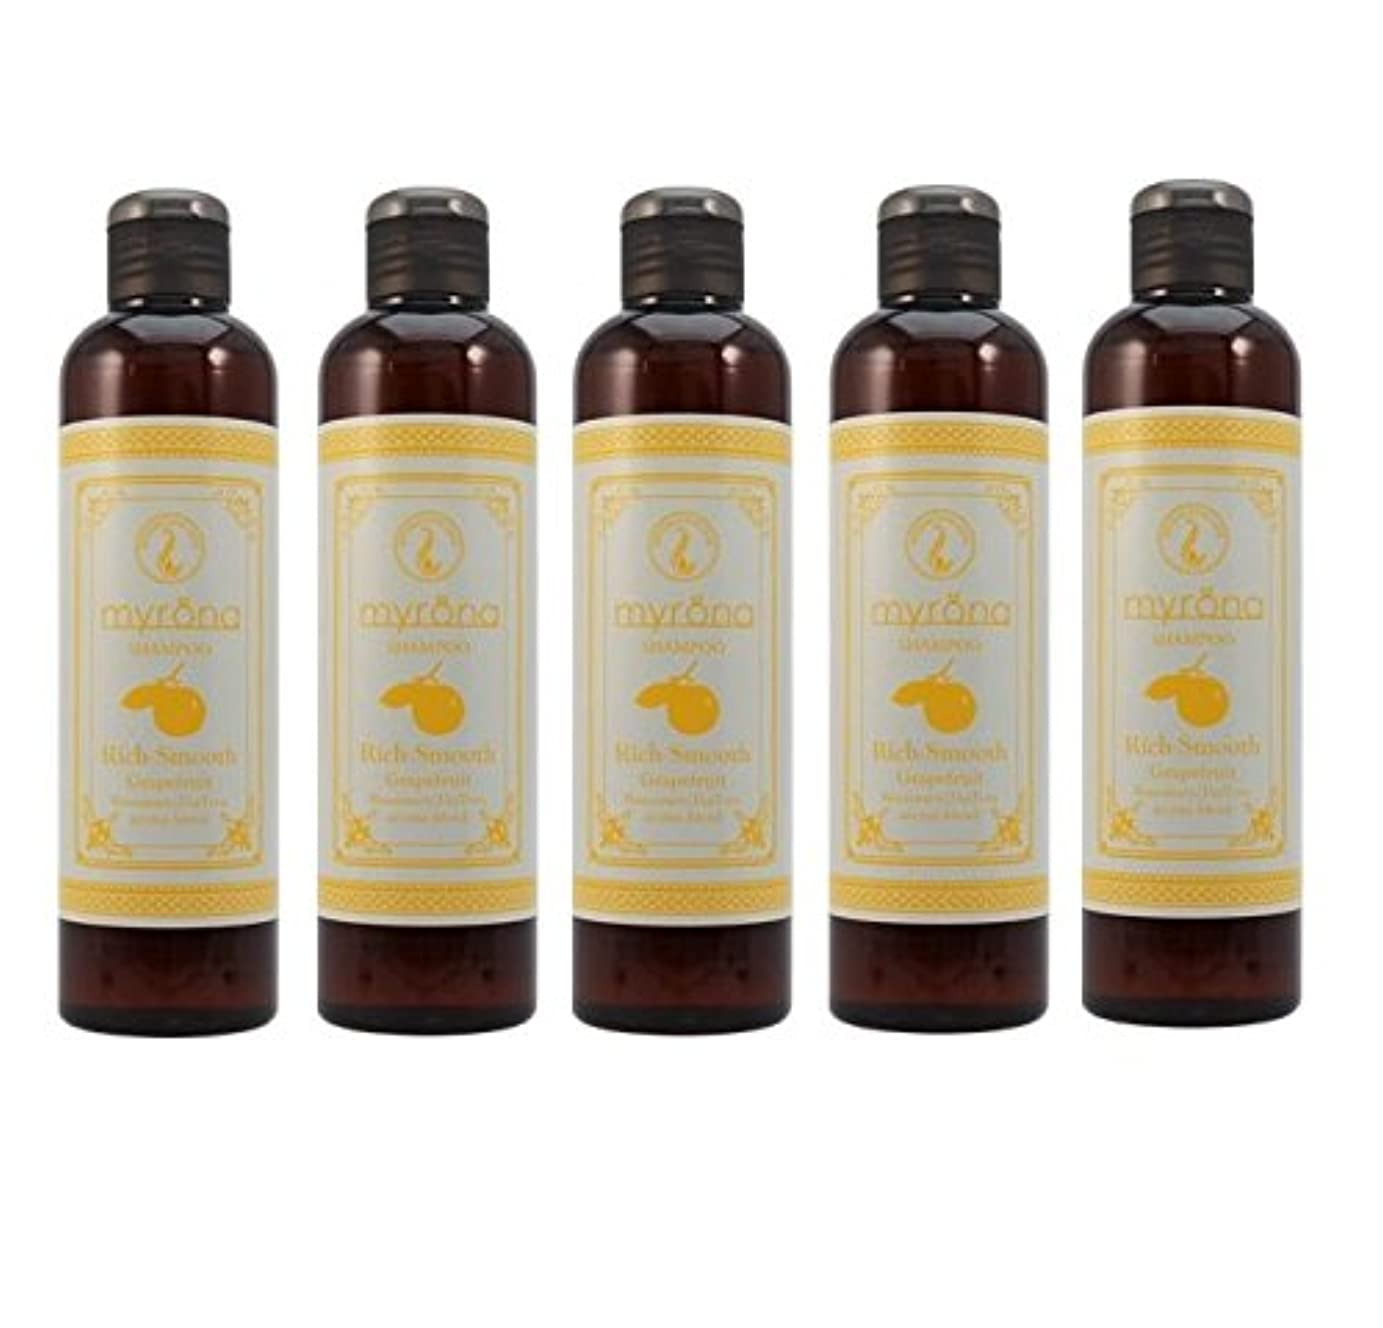 【X5個セット】 ビバニーズ ミュローナ ふんわリッチシャンプー(グレープフルーツの香り) 260ml 容器入り